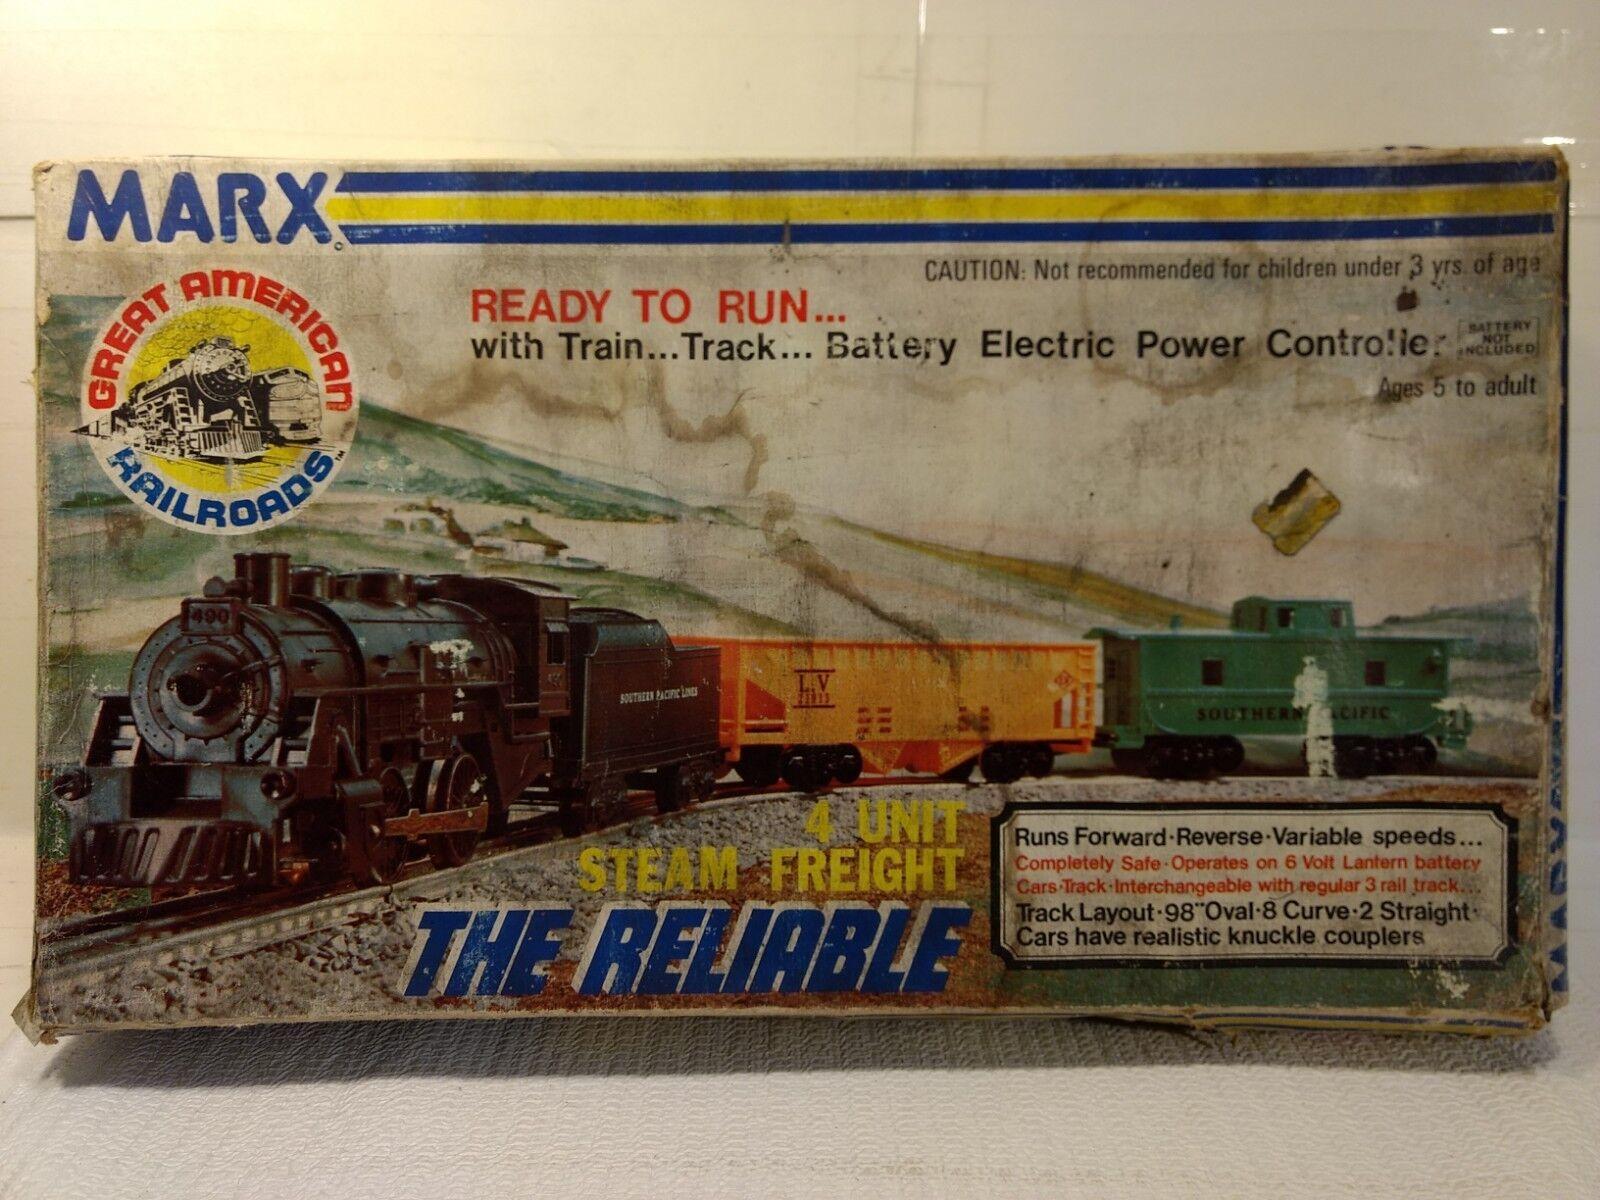 Marx listo para correr 4 unidad de vapor Tren de Cochega Set 2905 el calibre confiable o escala